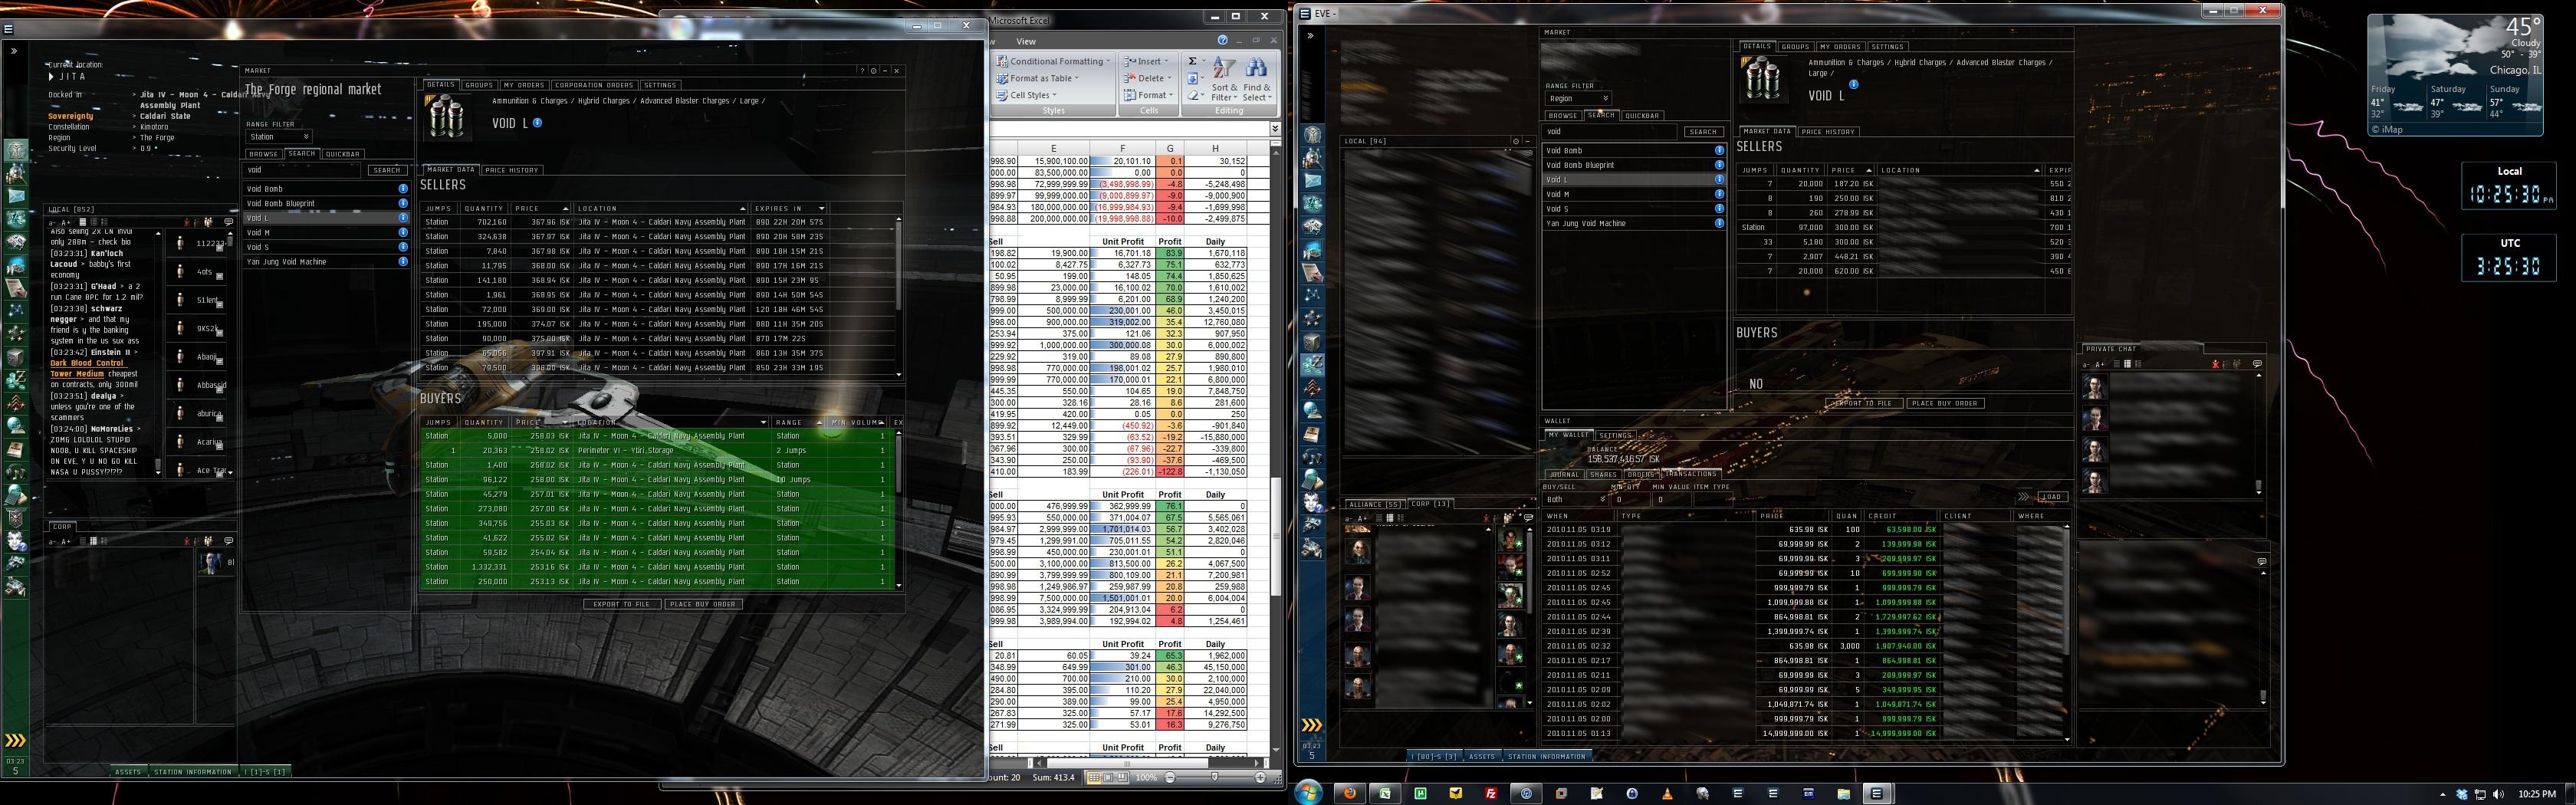 Eve online trading bot